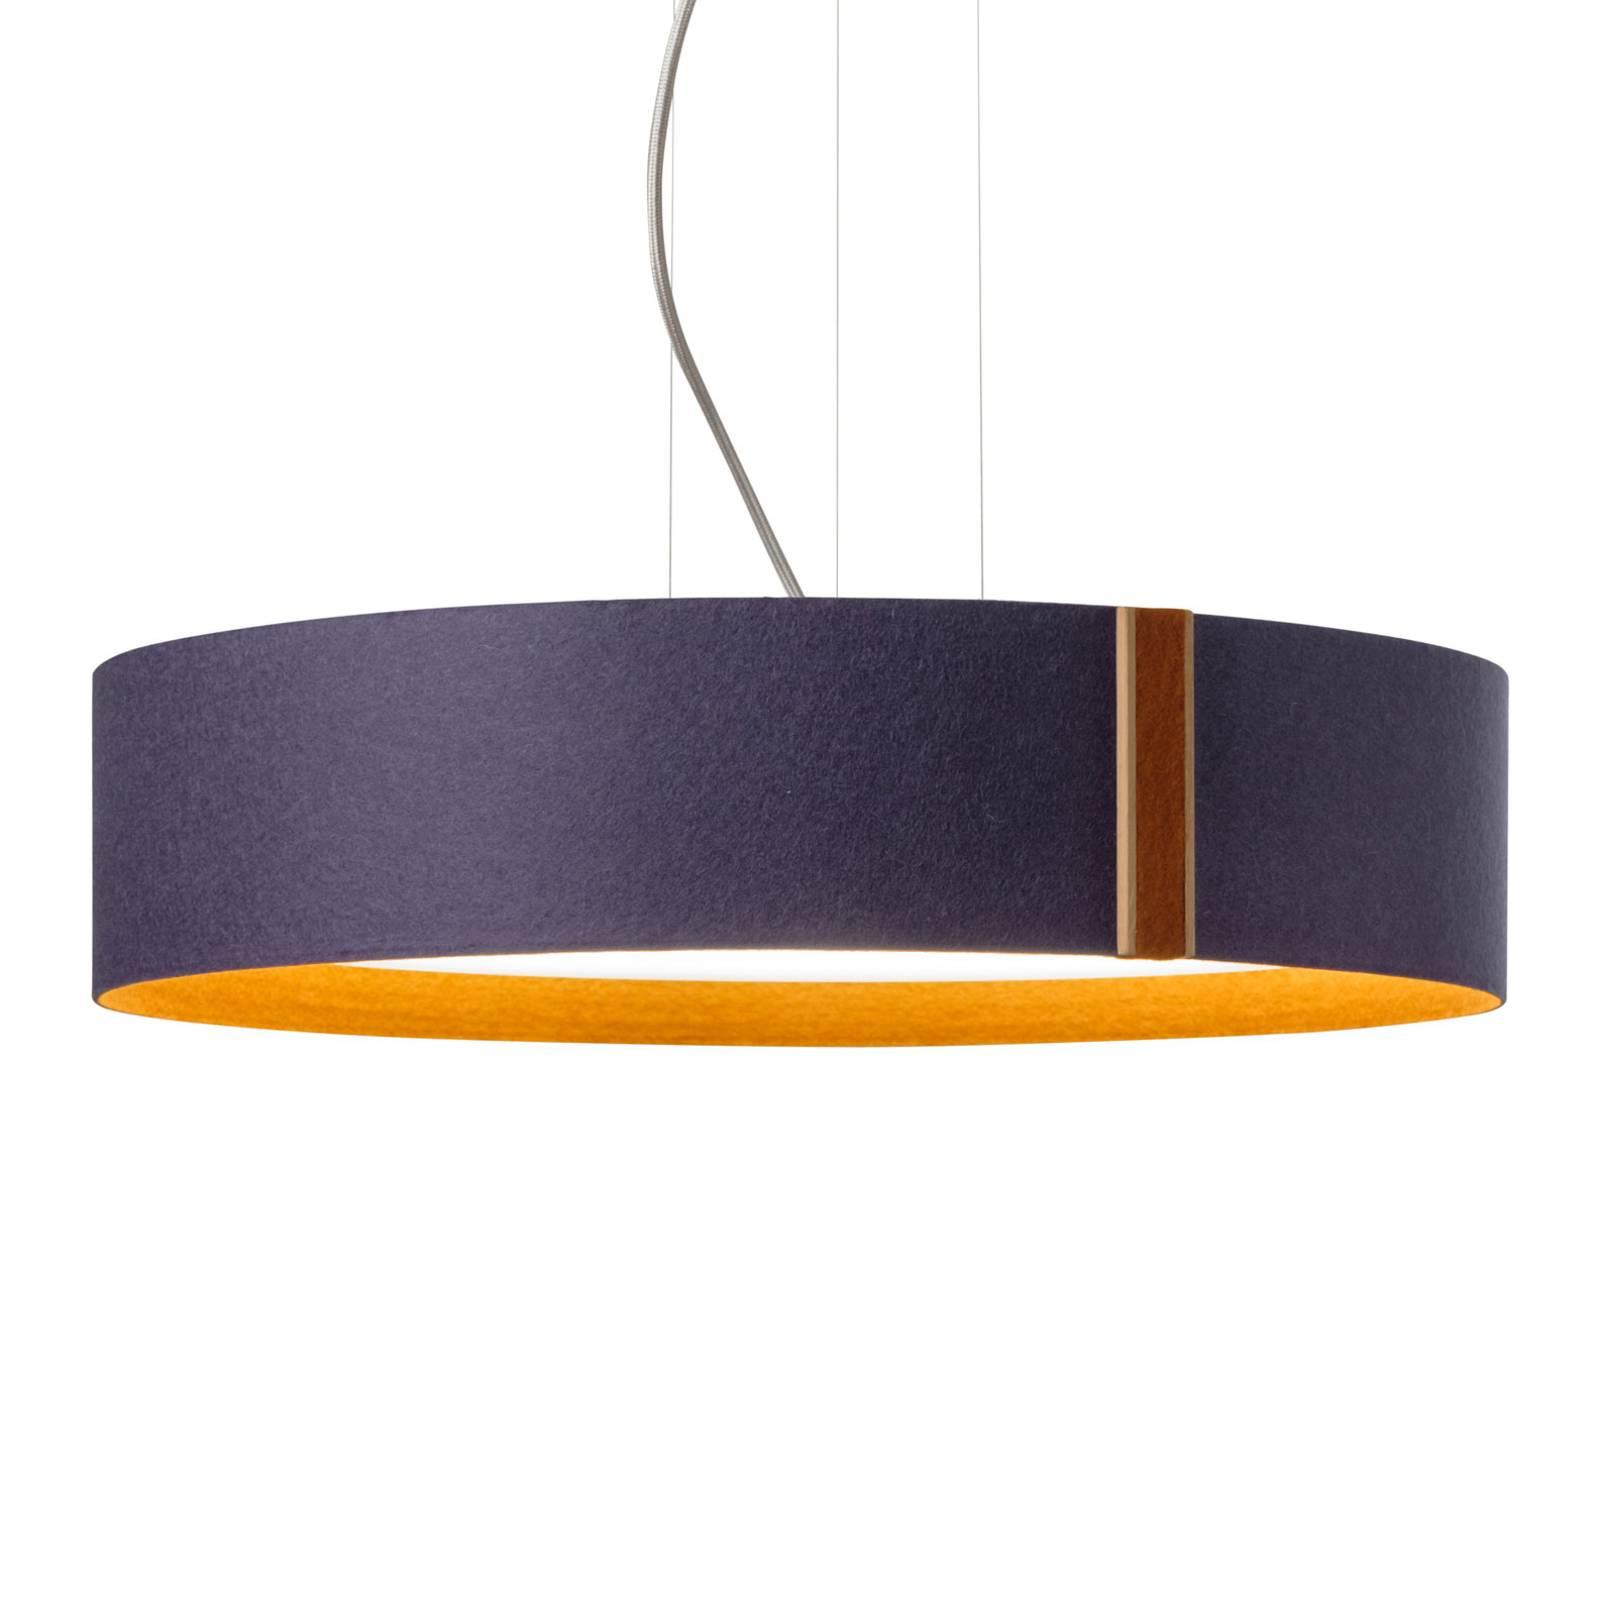 Suspension LED LARAfelt, Ø55cm, indigo/cannelle